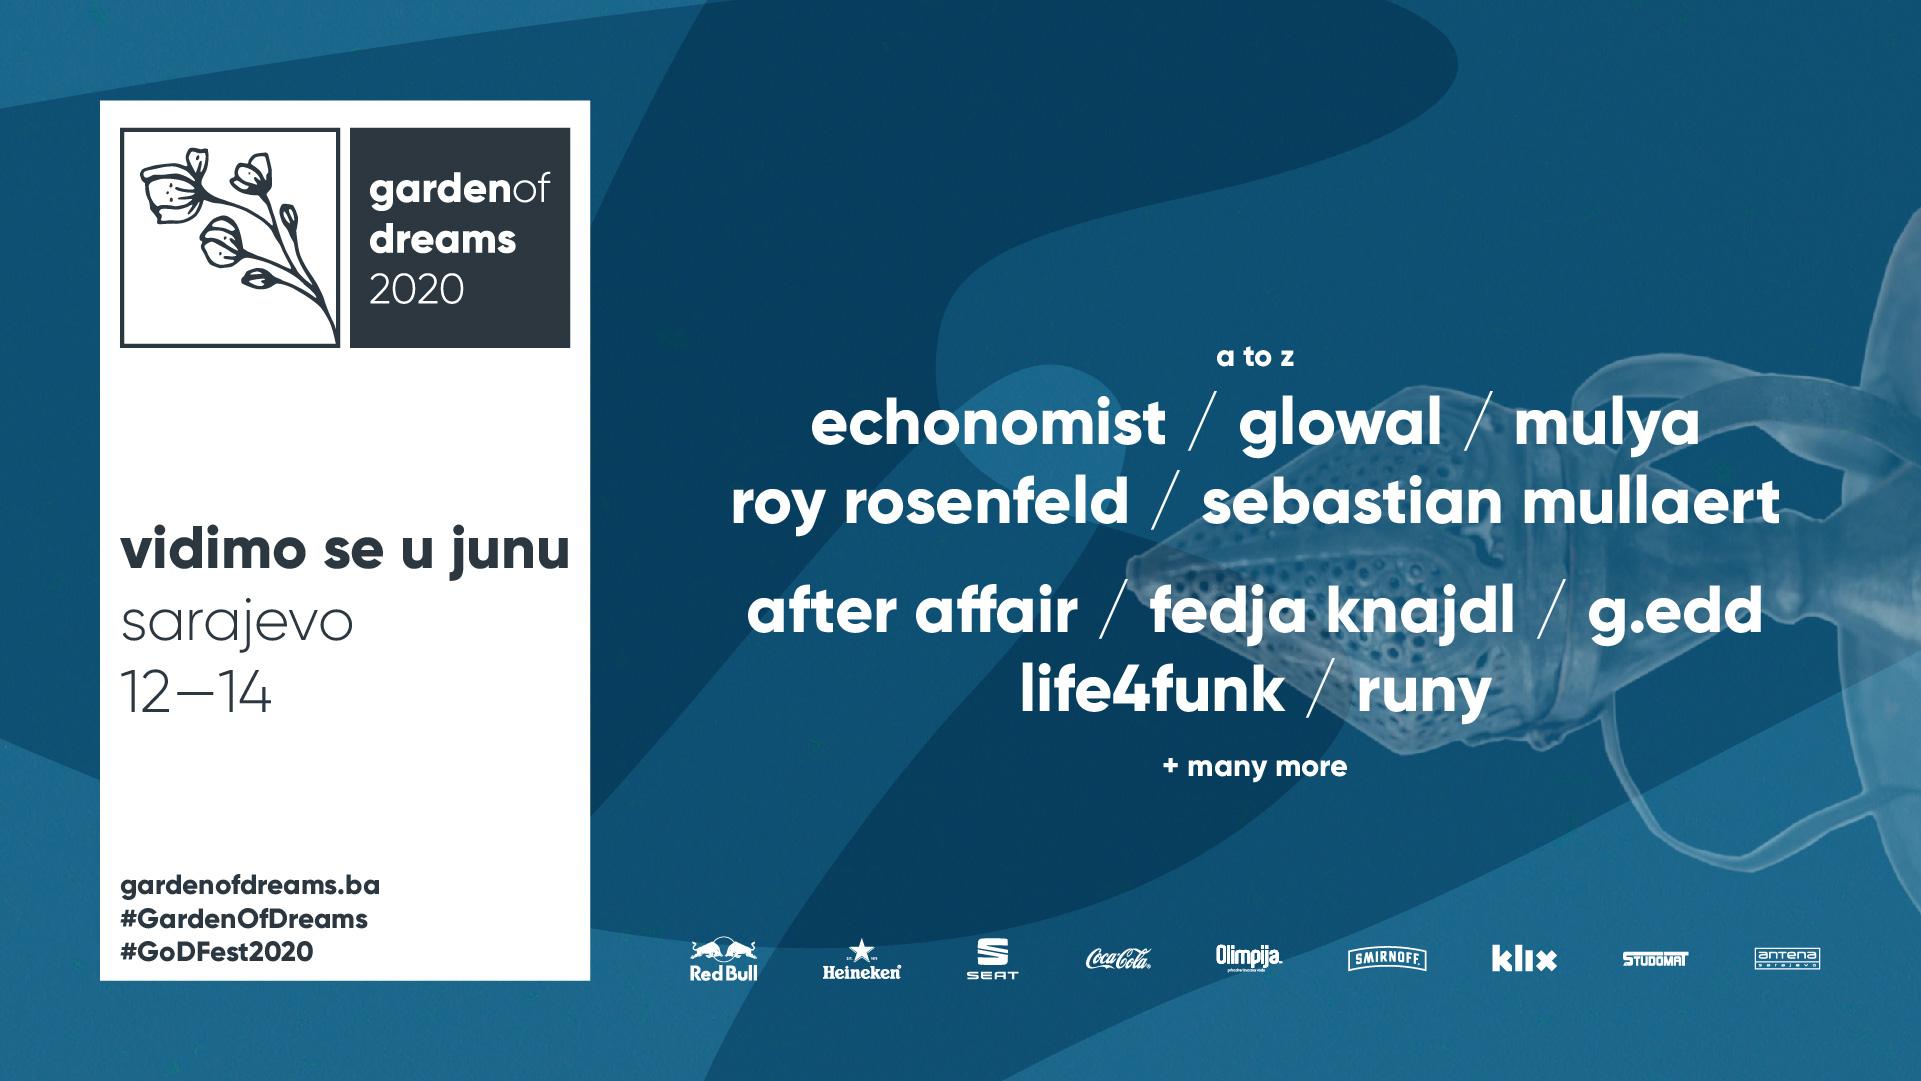 Prva faza lineupa: 10 veličanstvenih koji će zapaliti plesni podij drugog Garden of Dreams festivala